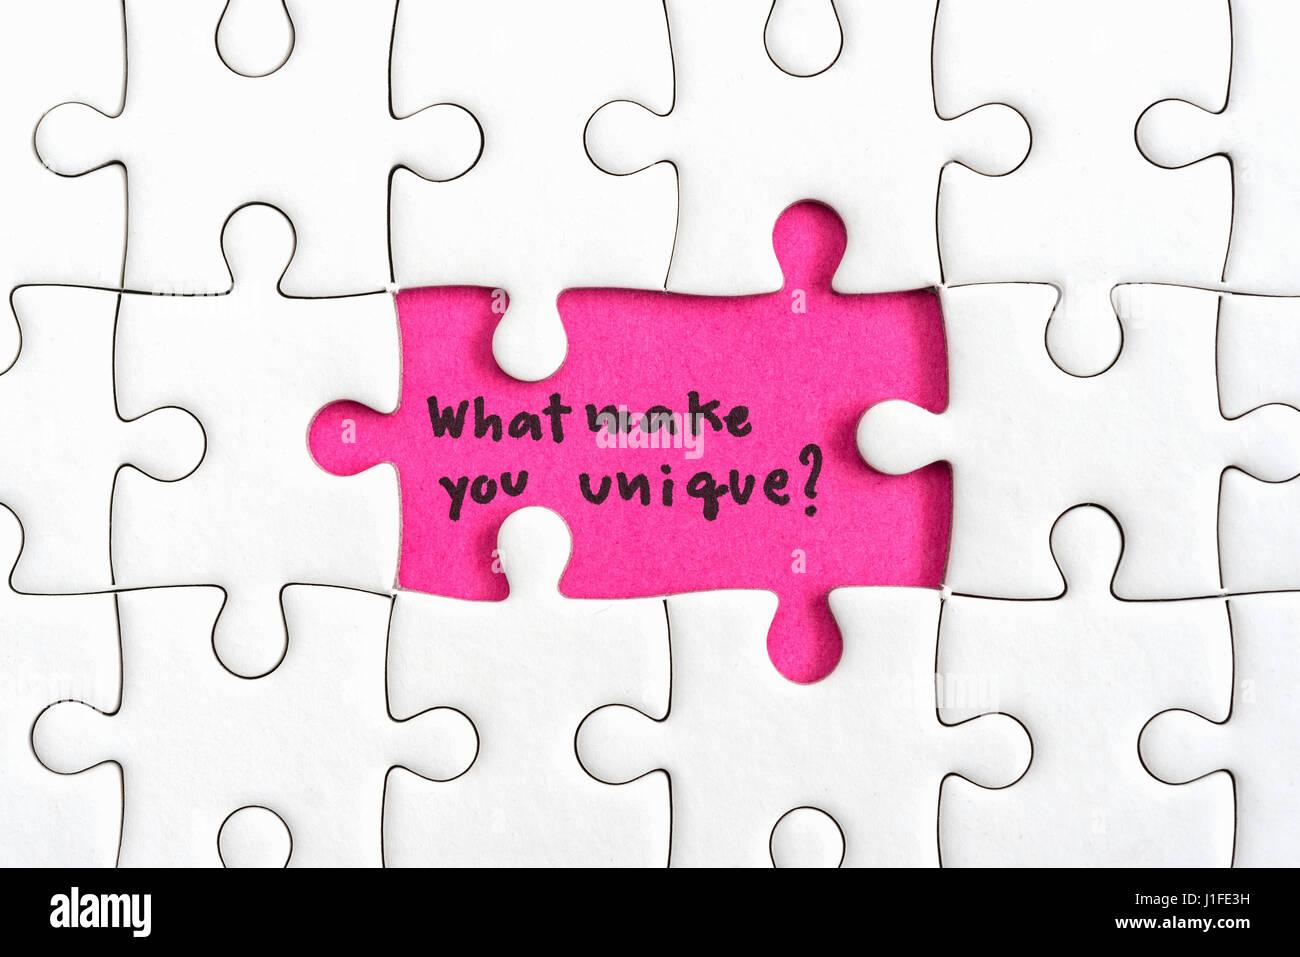 jigsaw puzzle piece with